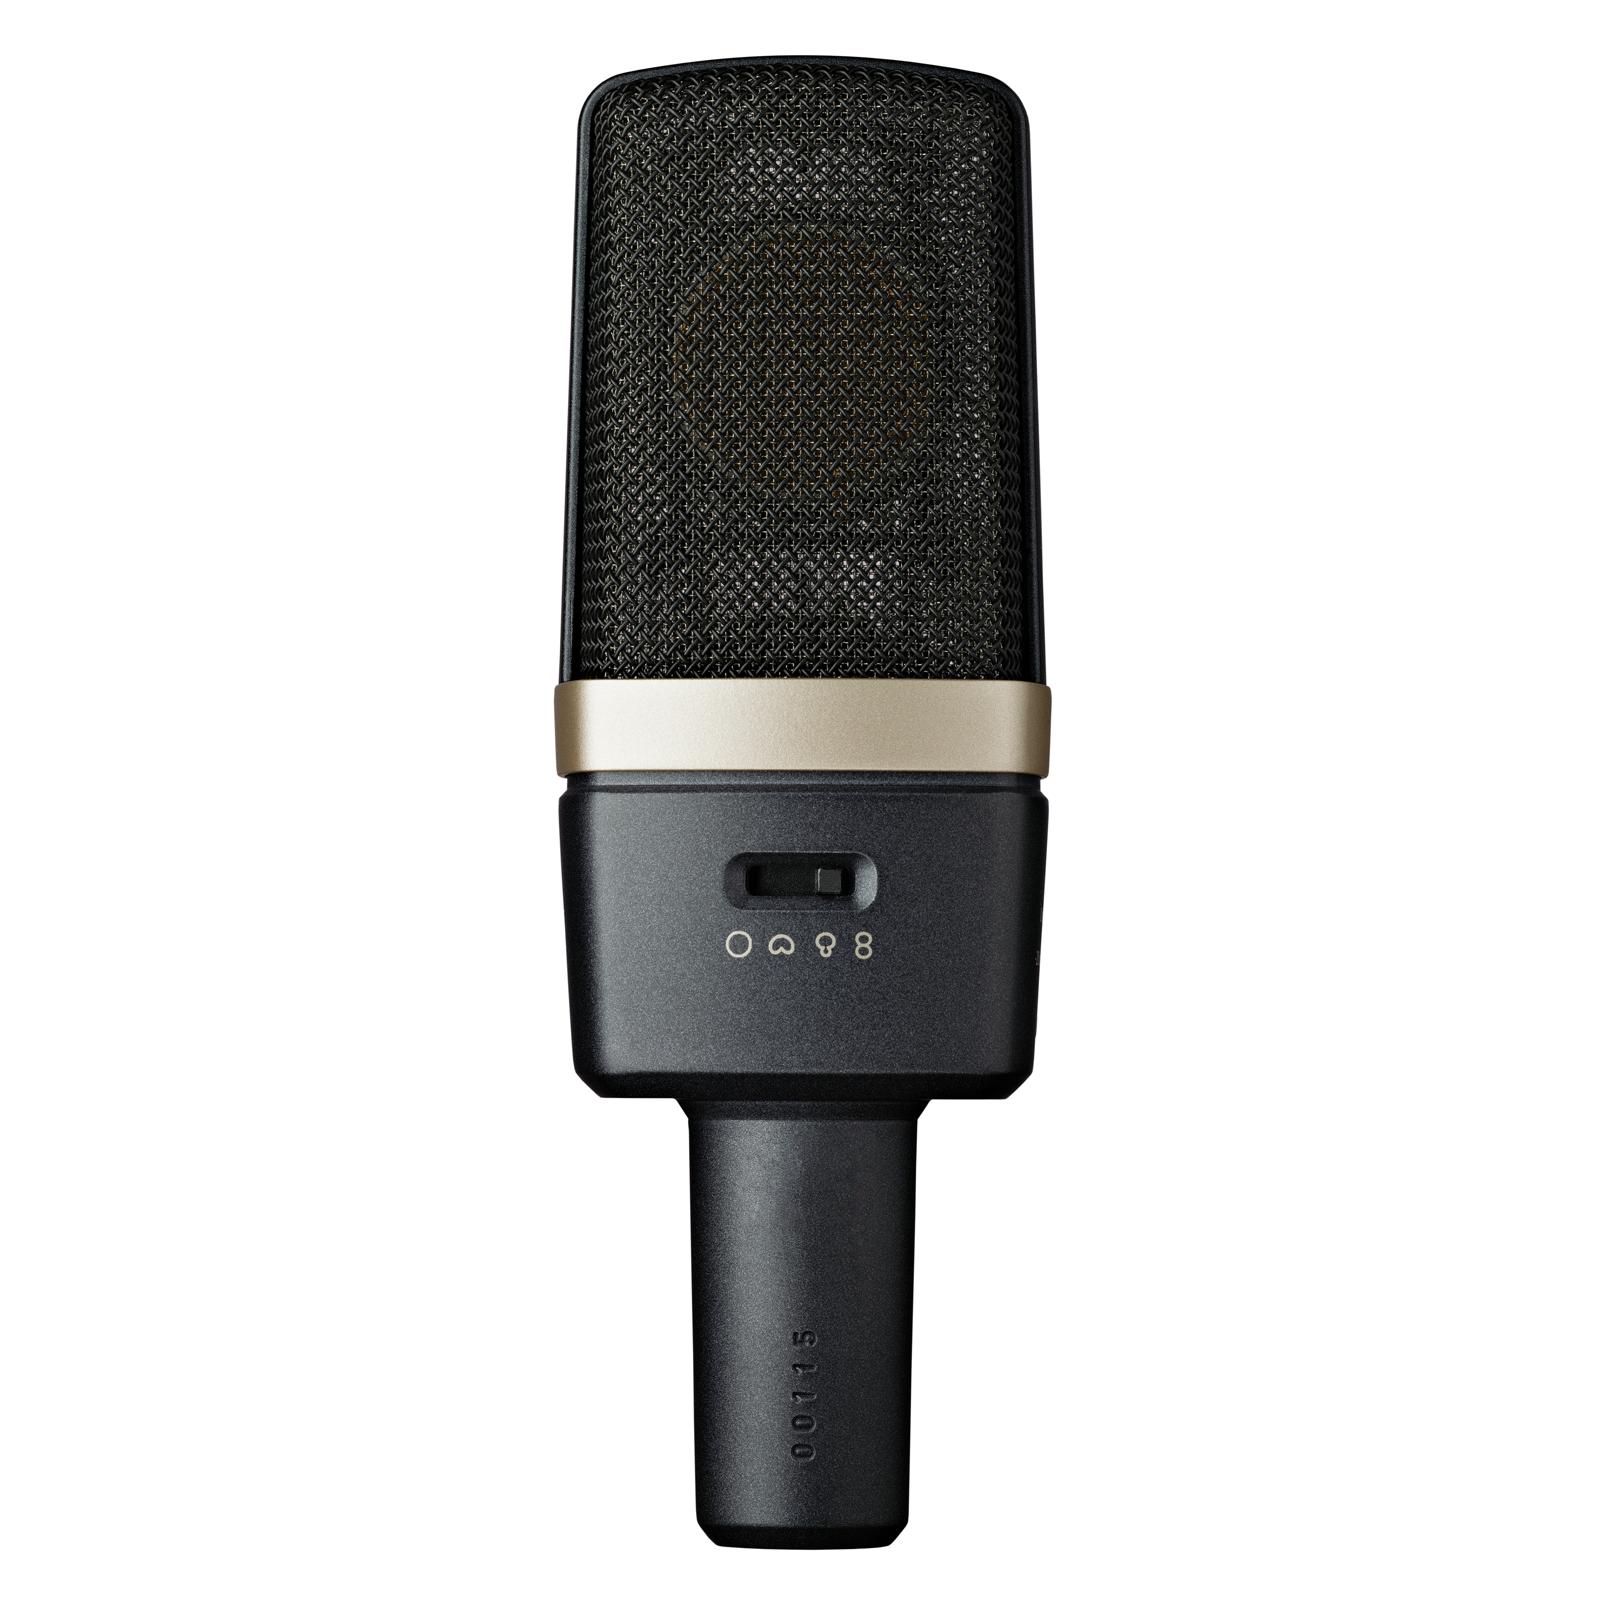 C314 - Black - Professional multi-pattern condenser microphone - Back